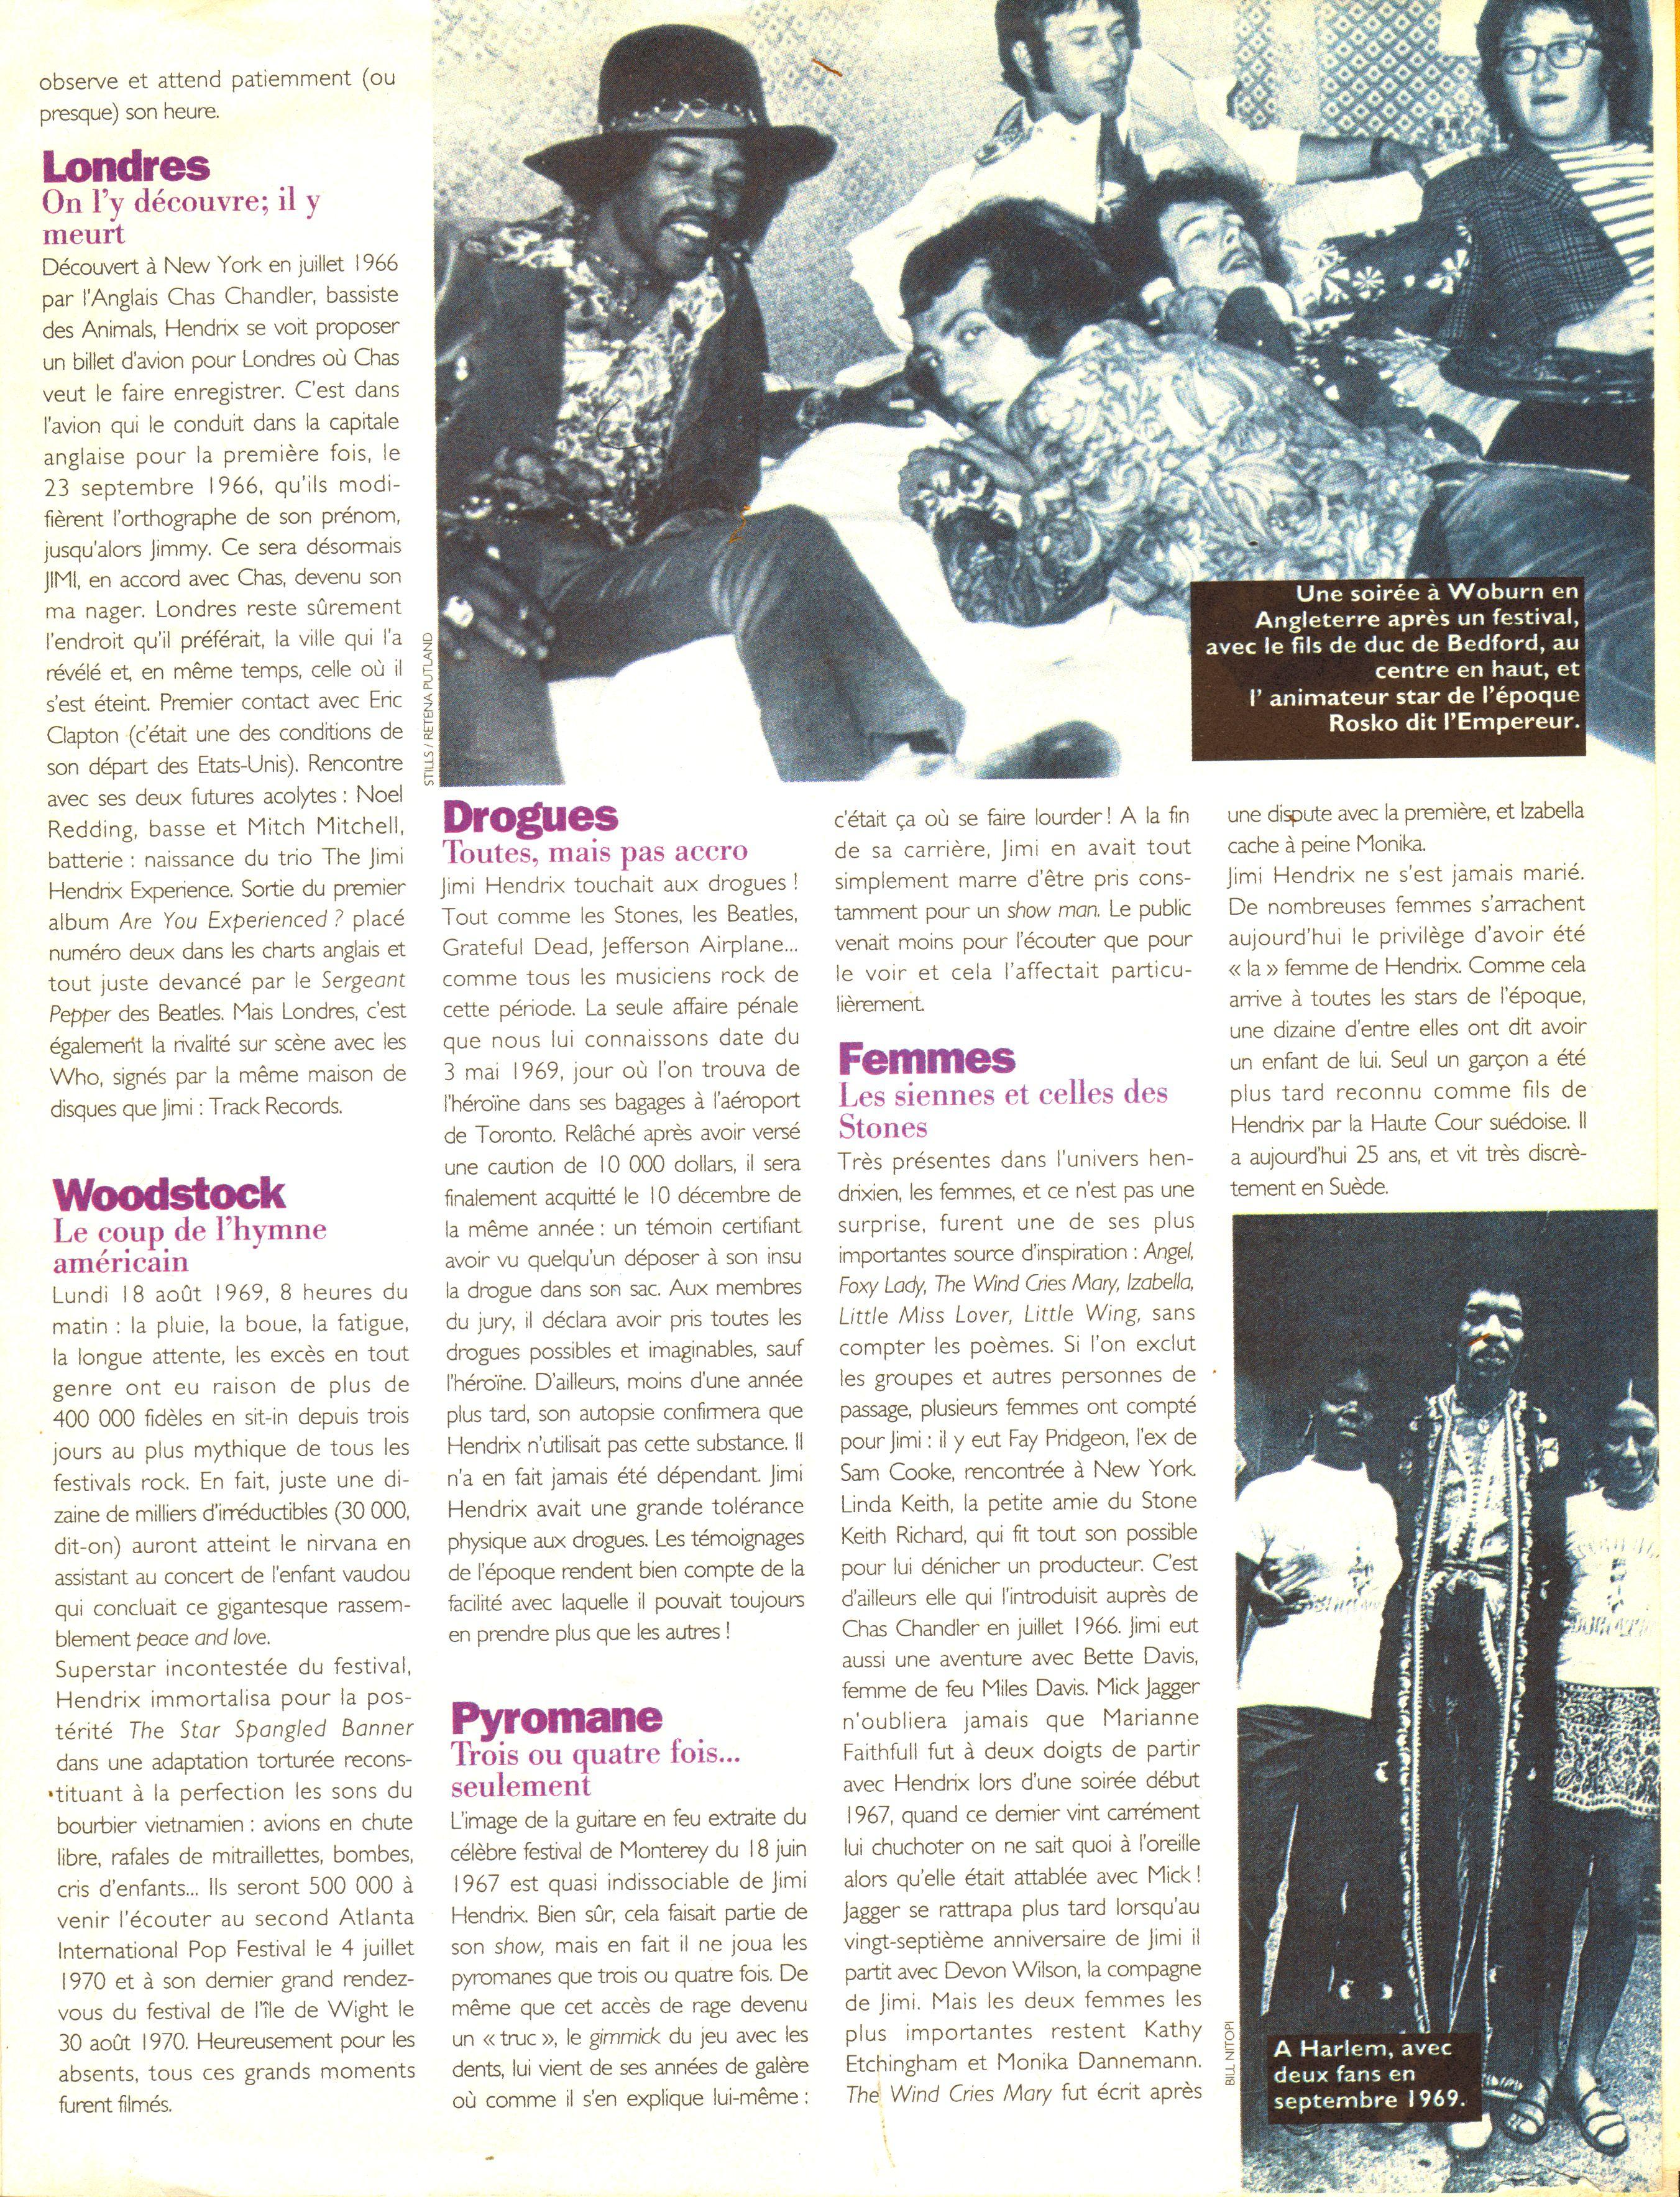 Magazines Français 1989 - 2014 GlobeHebdo26Janvier1reFevrier1994Page07